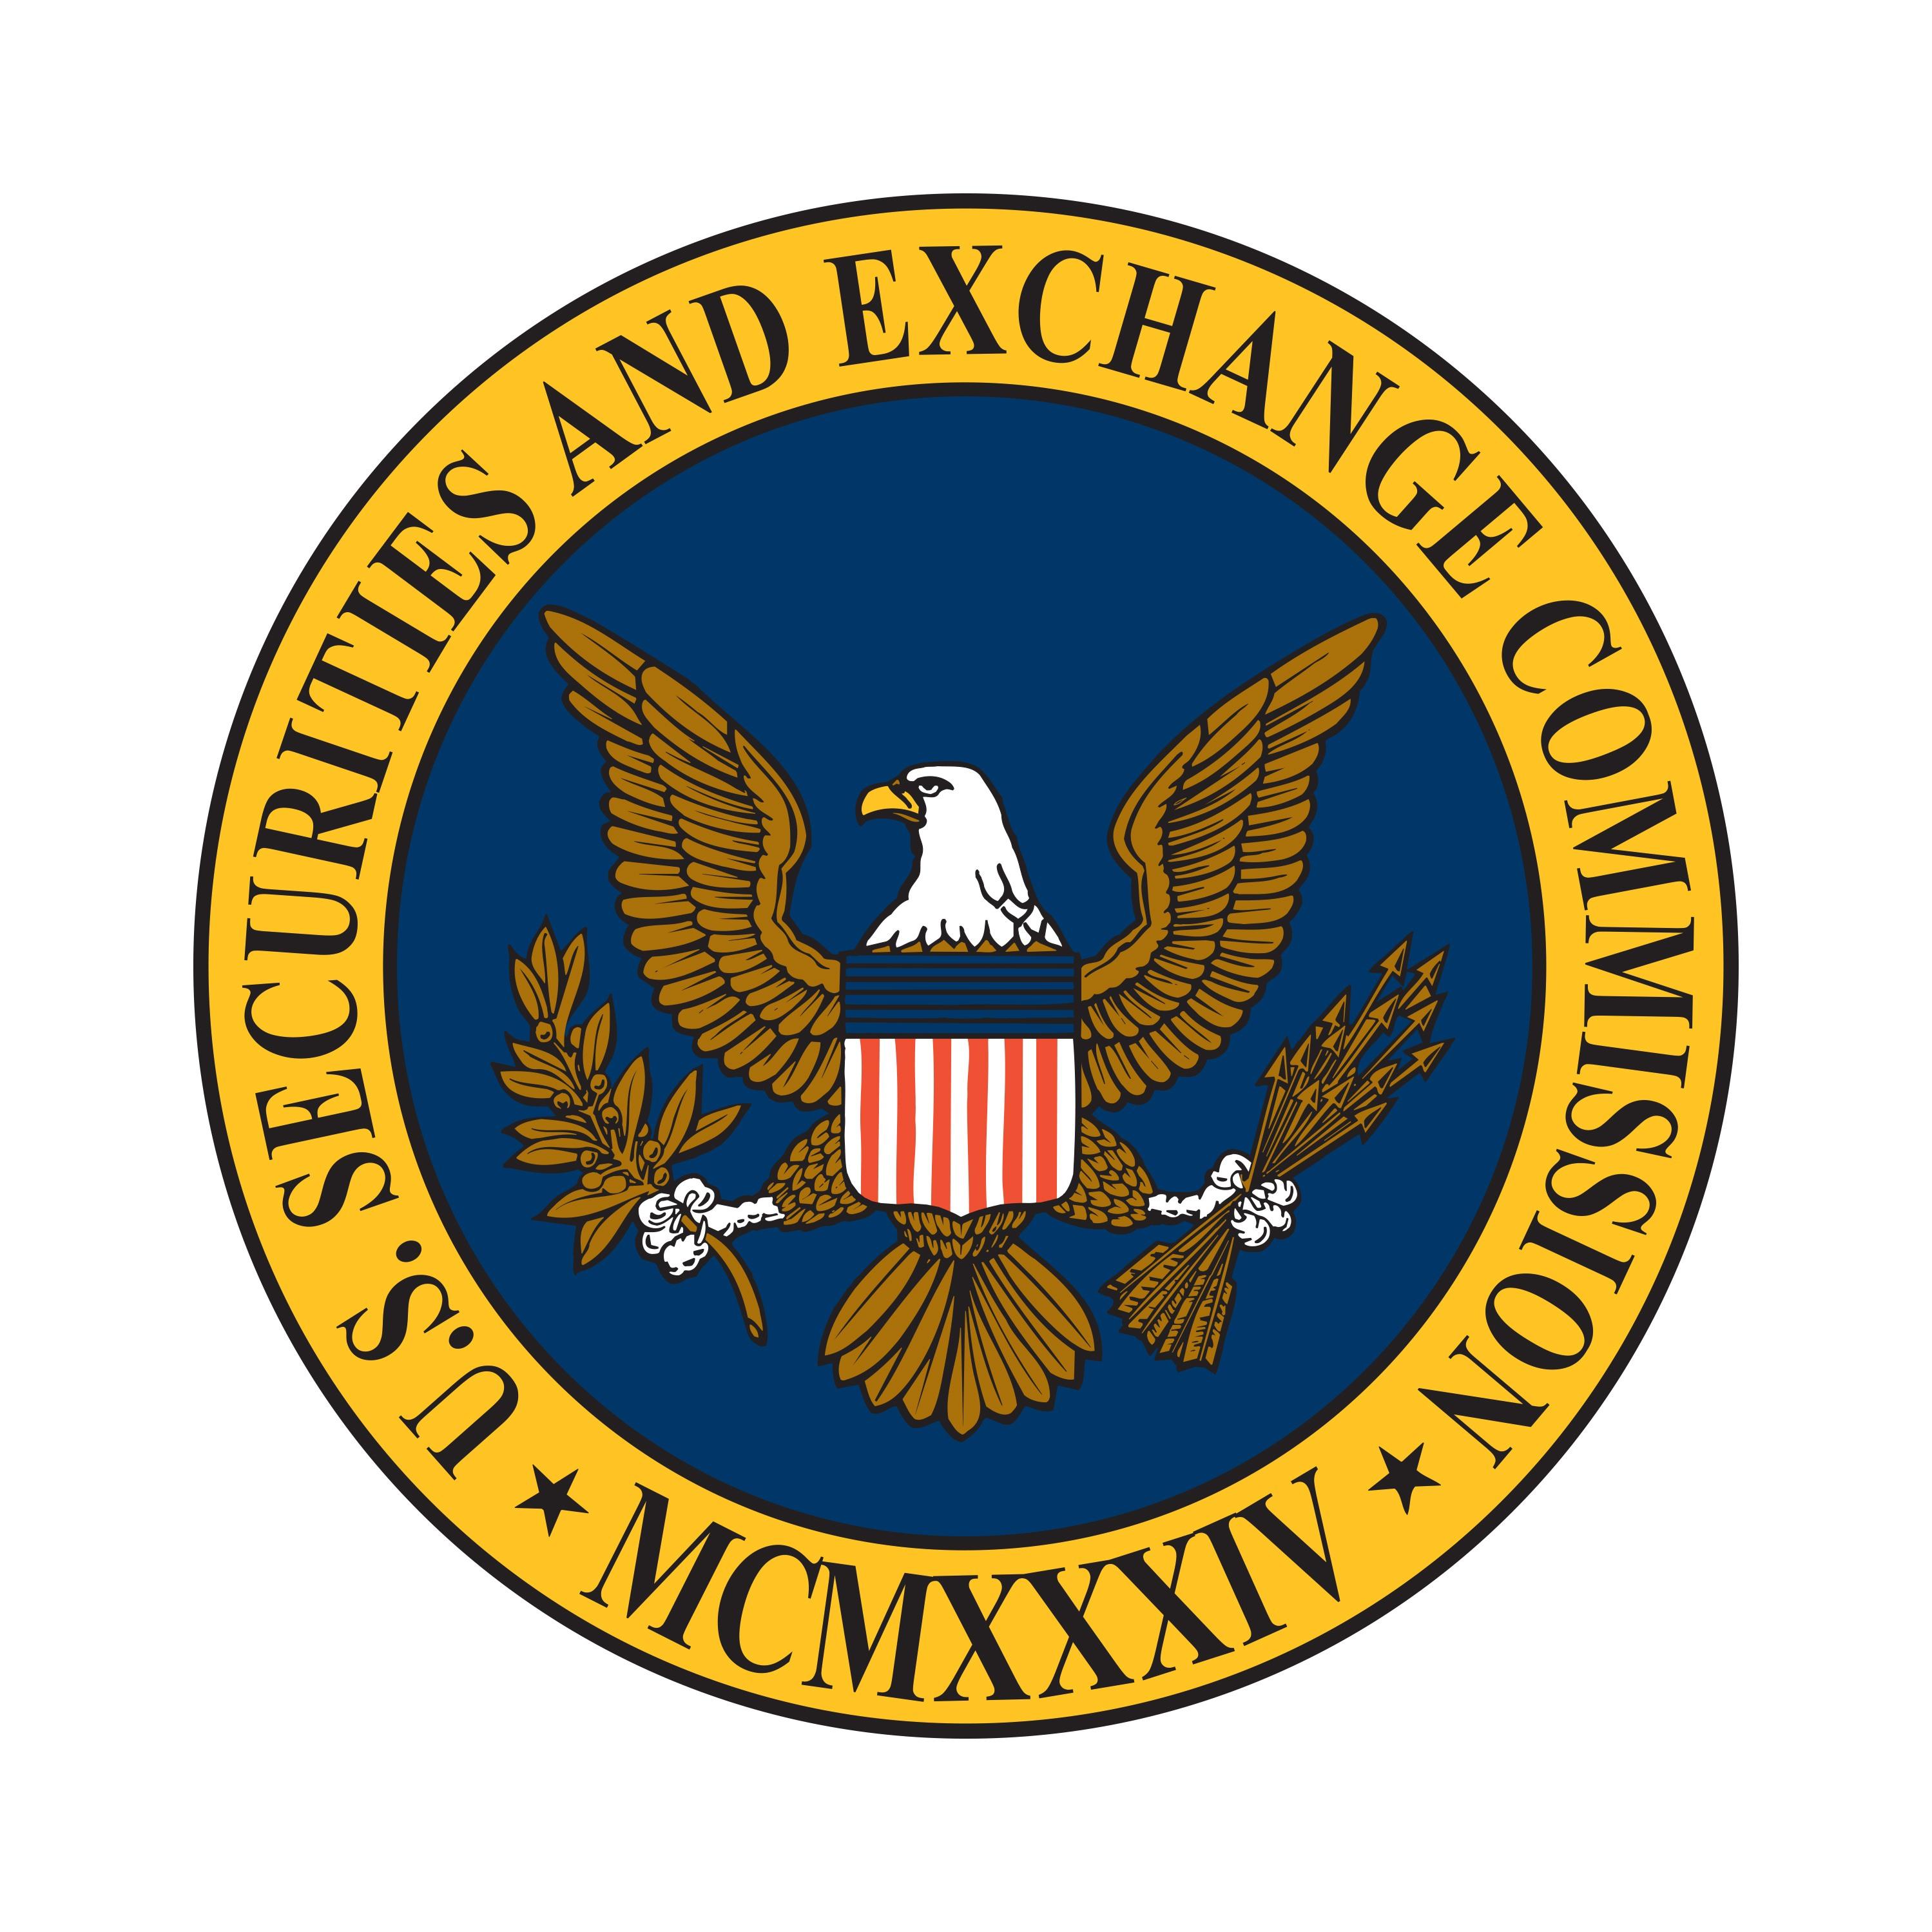 SEC обнародовала переписку Павла Дурова с инвесторами TON